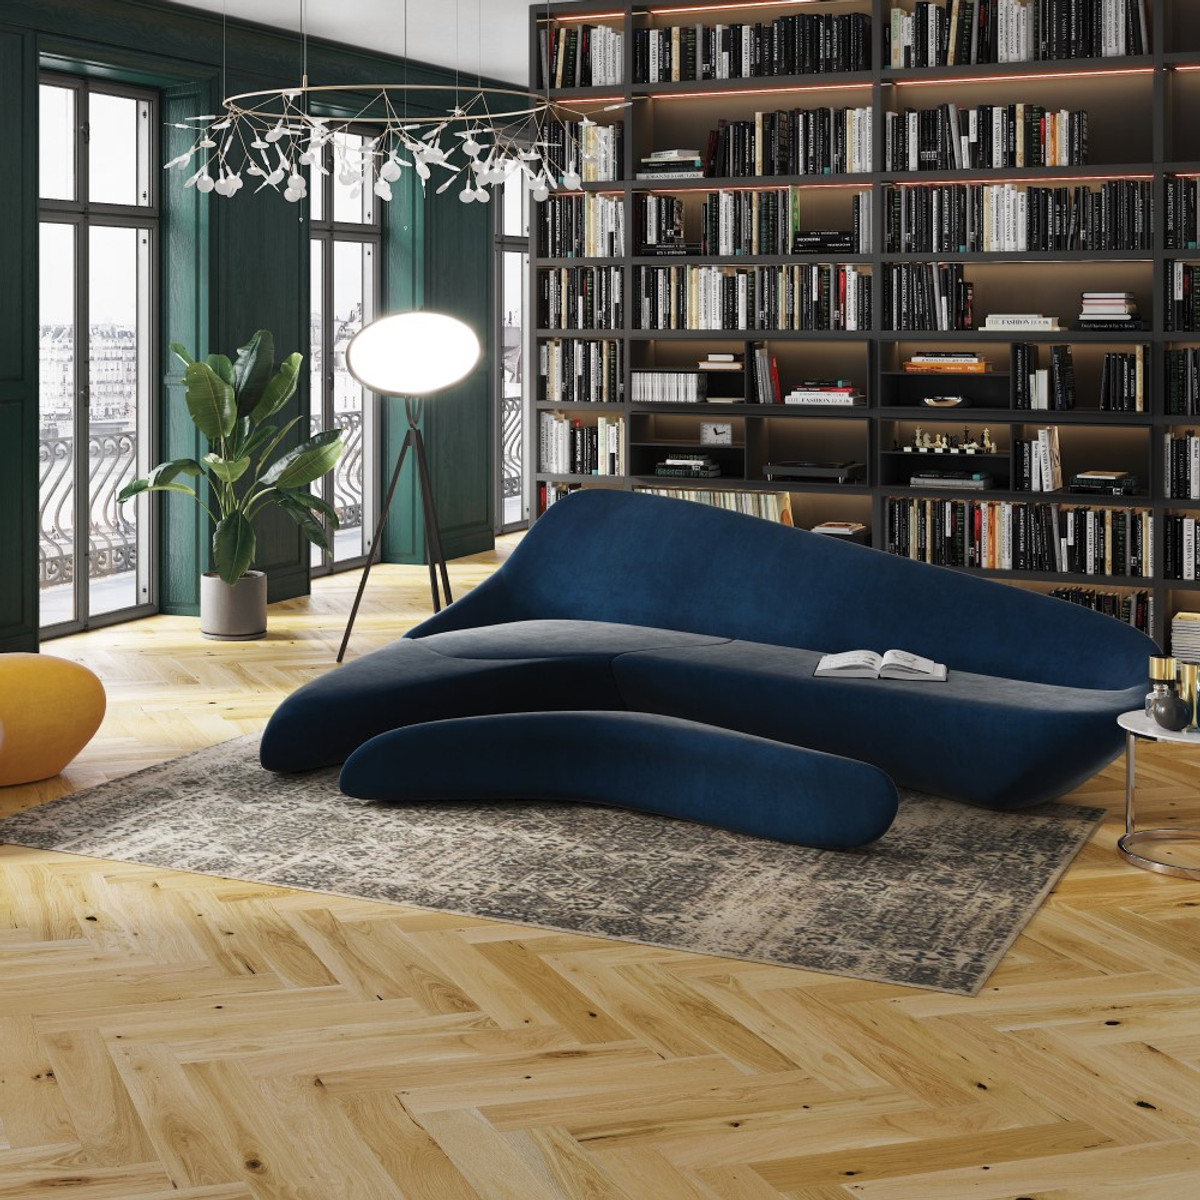 Tuscany Herringbone Oak brushed Natural Oiled Room Setting order instore or online today @ www.tuscanytiles.co.uk